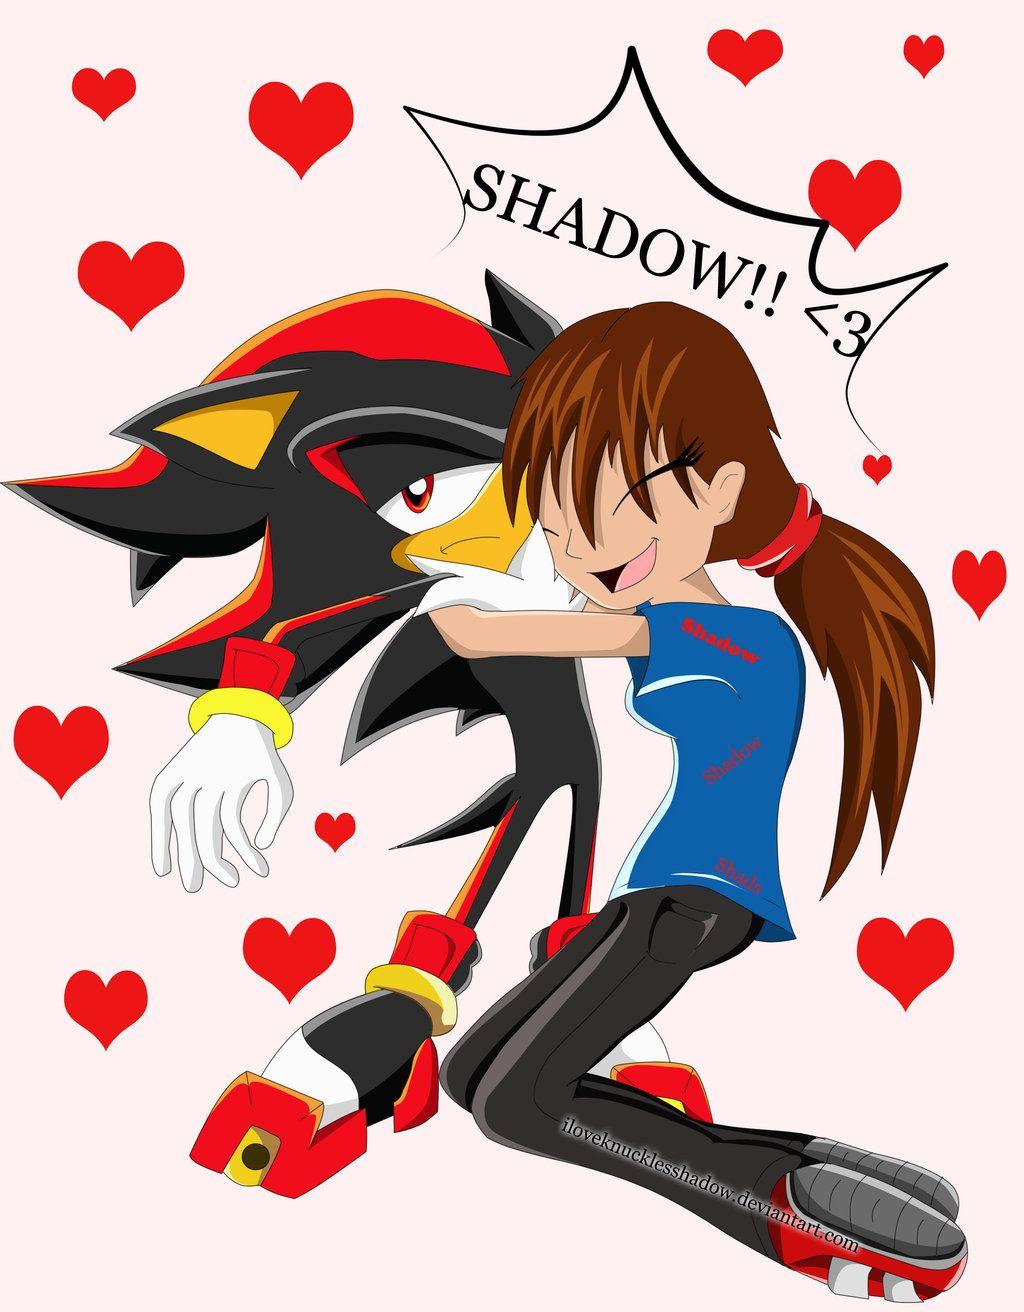 shadow fangirls - Google Search